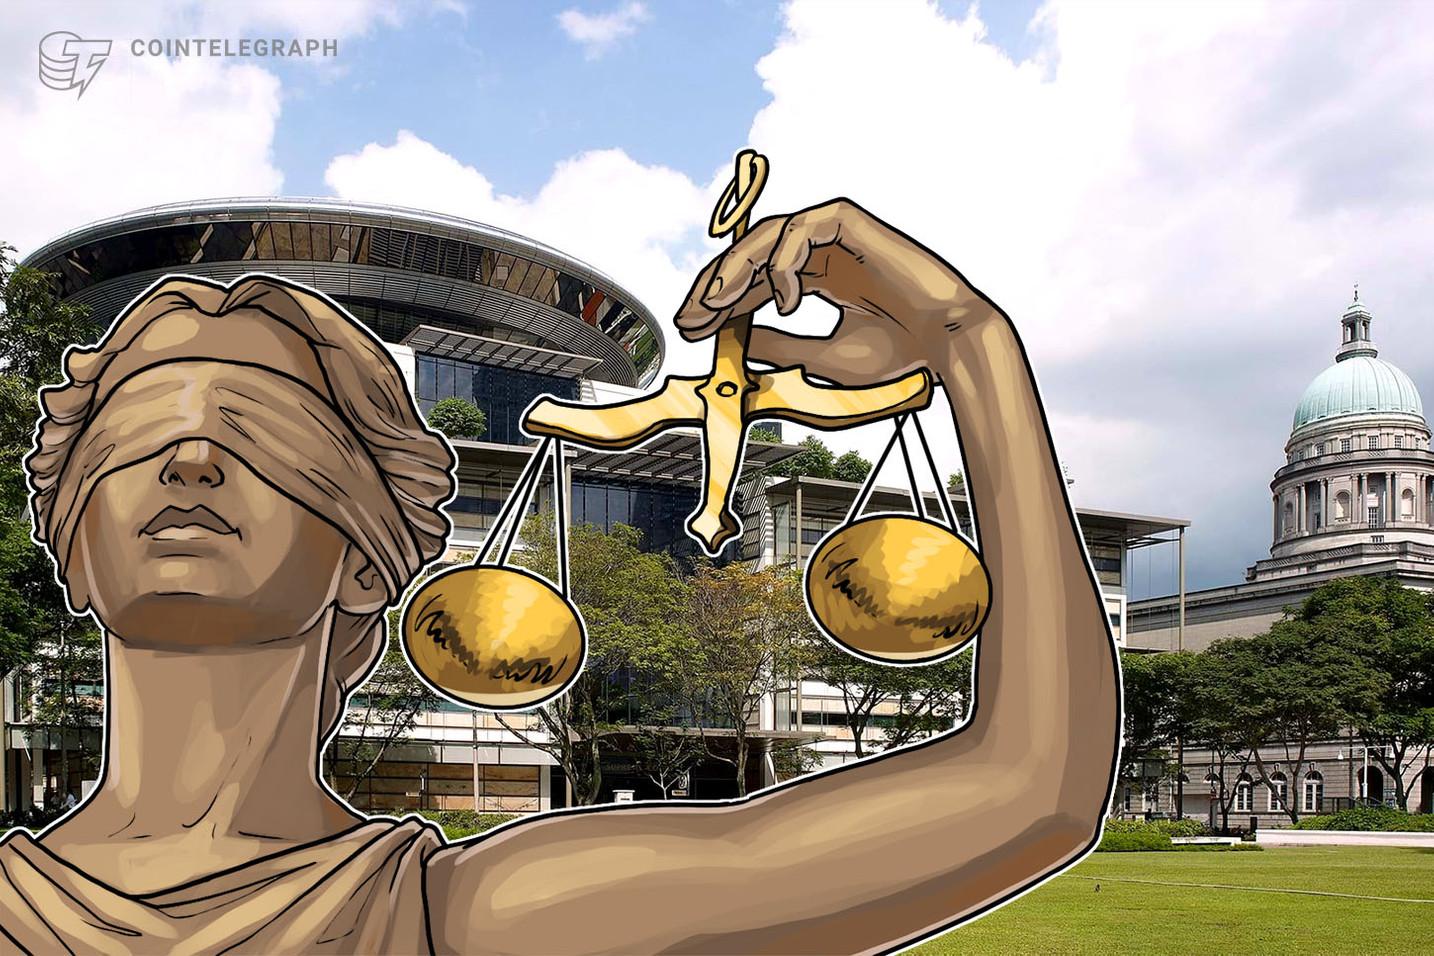 Singapurs erstes BTC-Gerichtsverfahren: Liquiditätsanbieter verklagt Kryptobörse auf 12 Mio. Euro